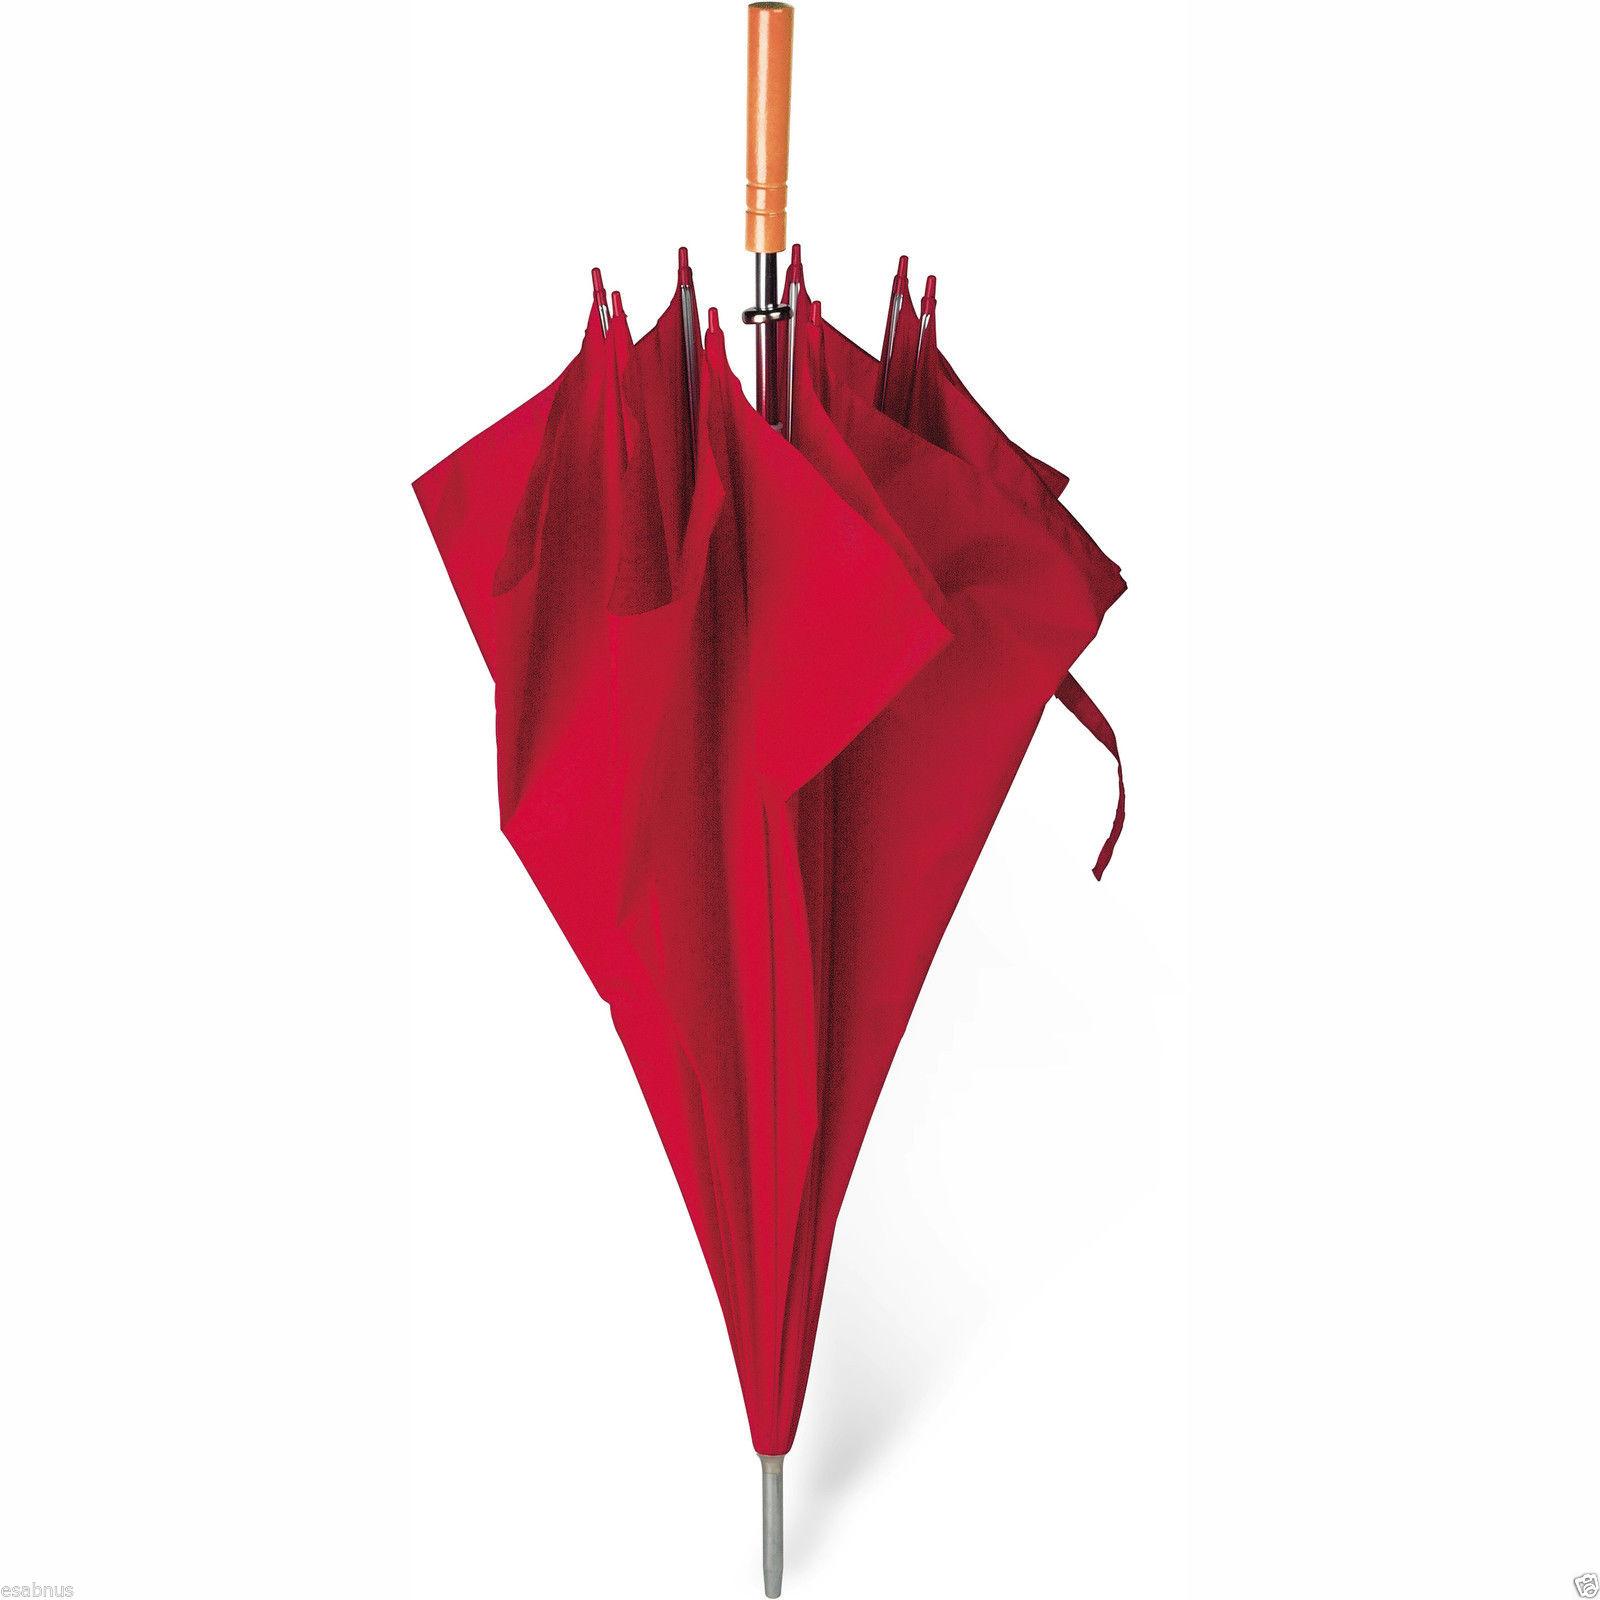 apertura-manual-Golf-Paraguas-132cm-132cm-Madera-Agarre-190t-poliester